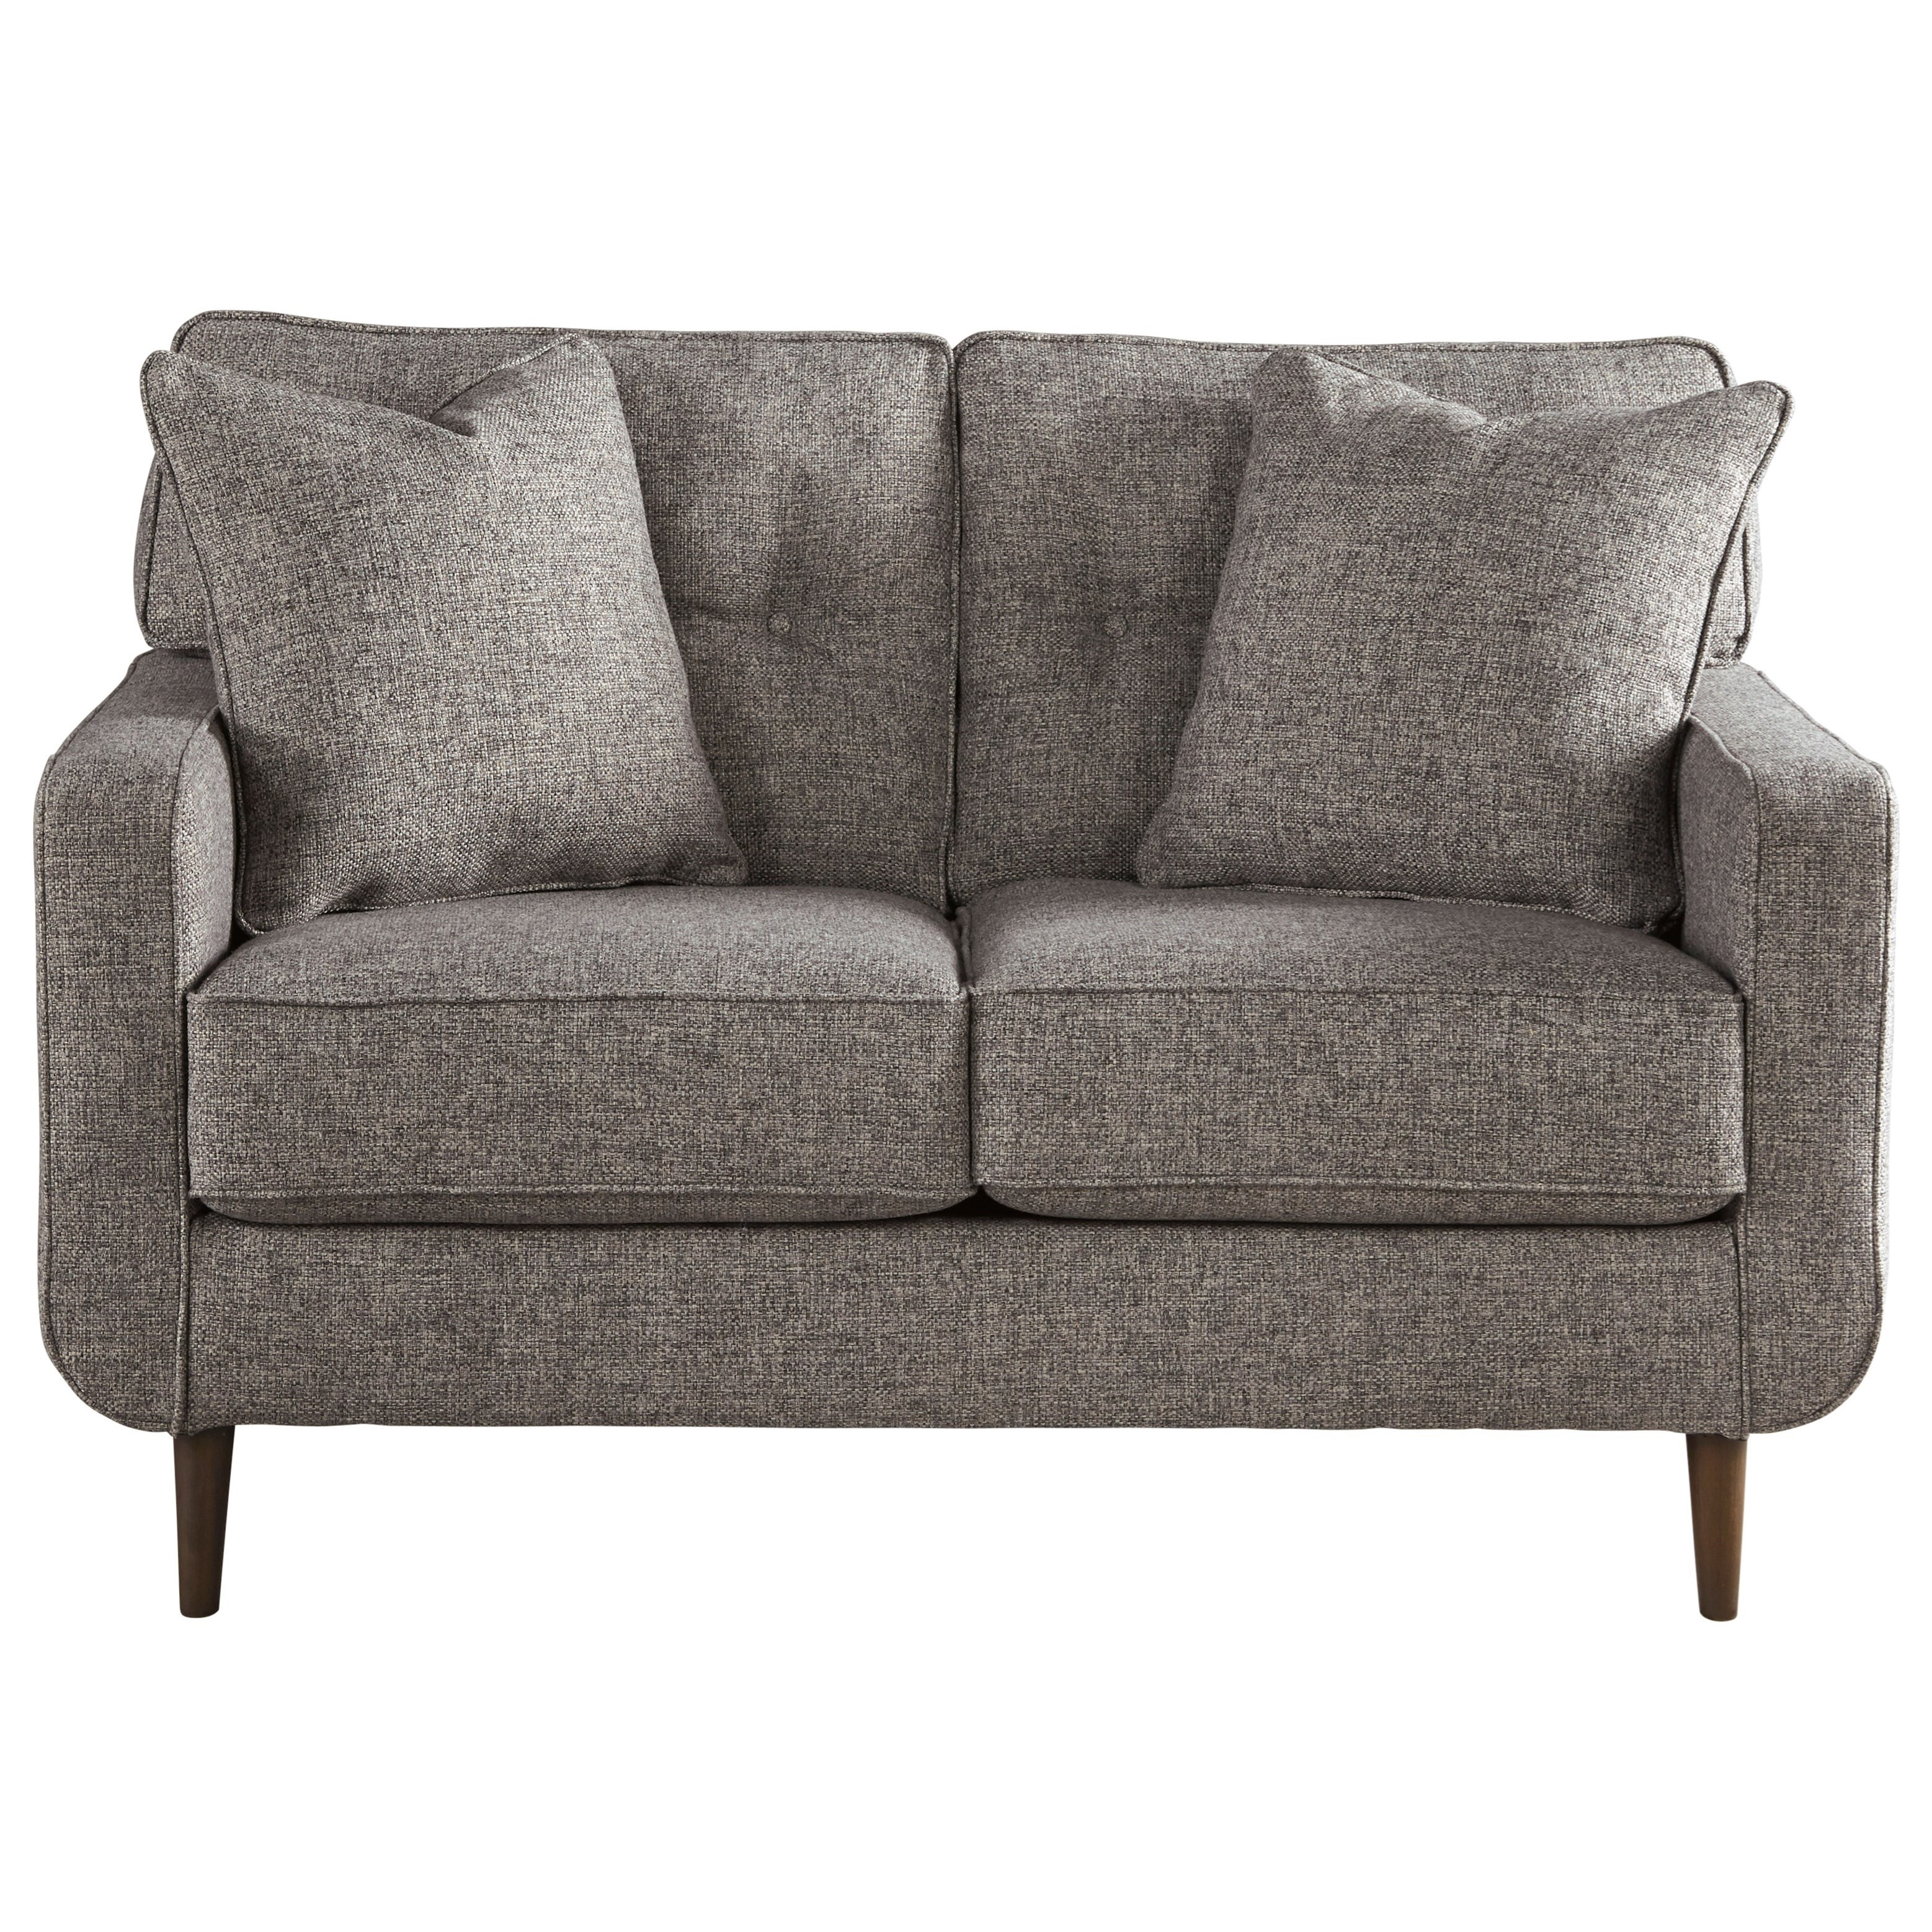 Levitz Furniture Stores: Ashley Furniture Zardoni 1140235 Mid-Century Modern